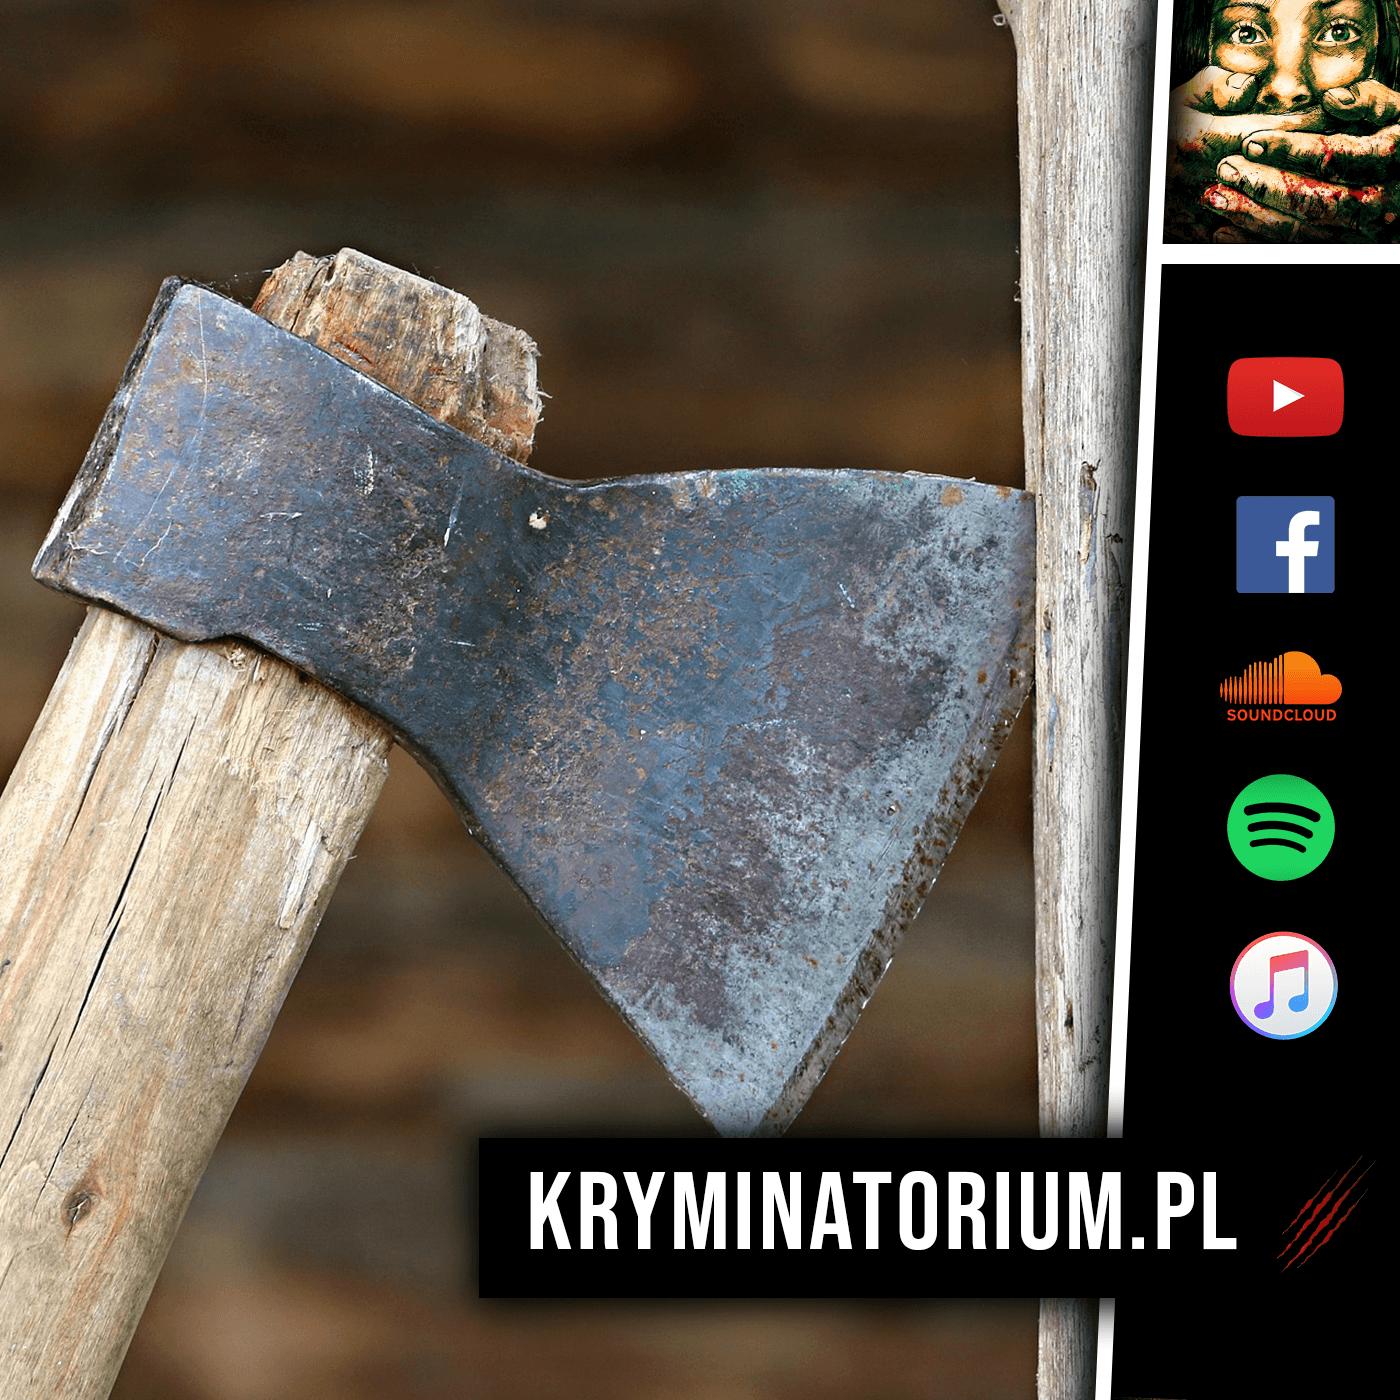 www.kryminatorium.pl